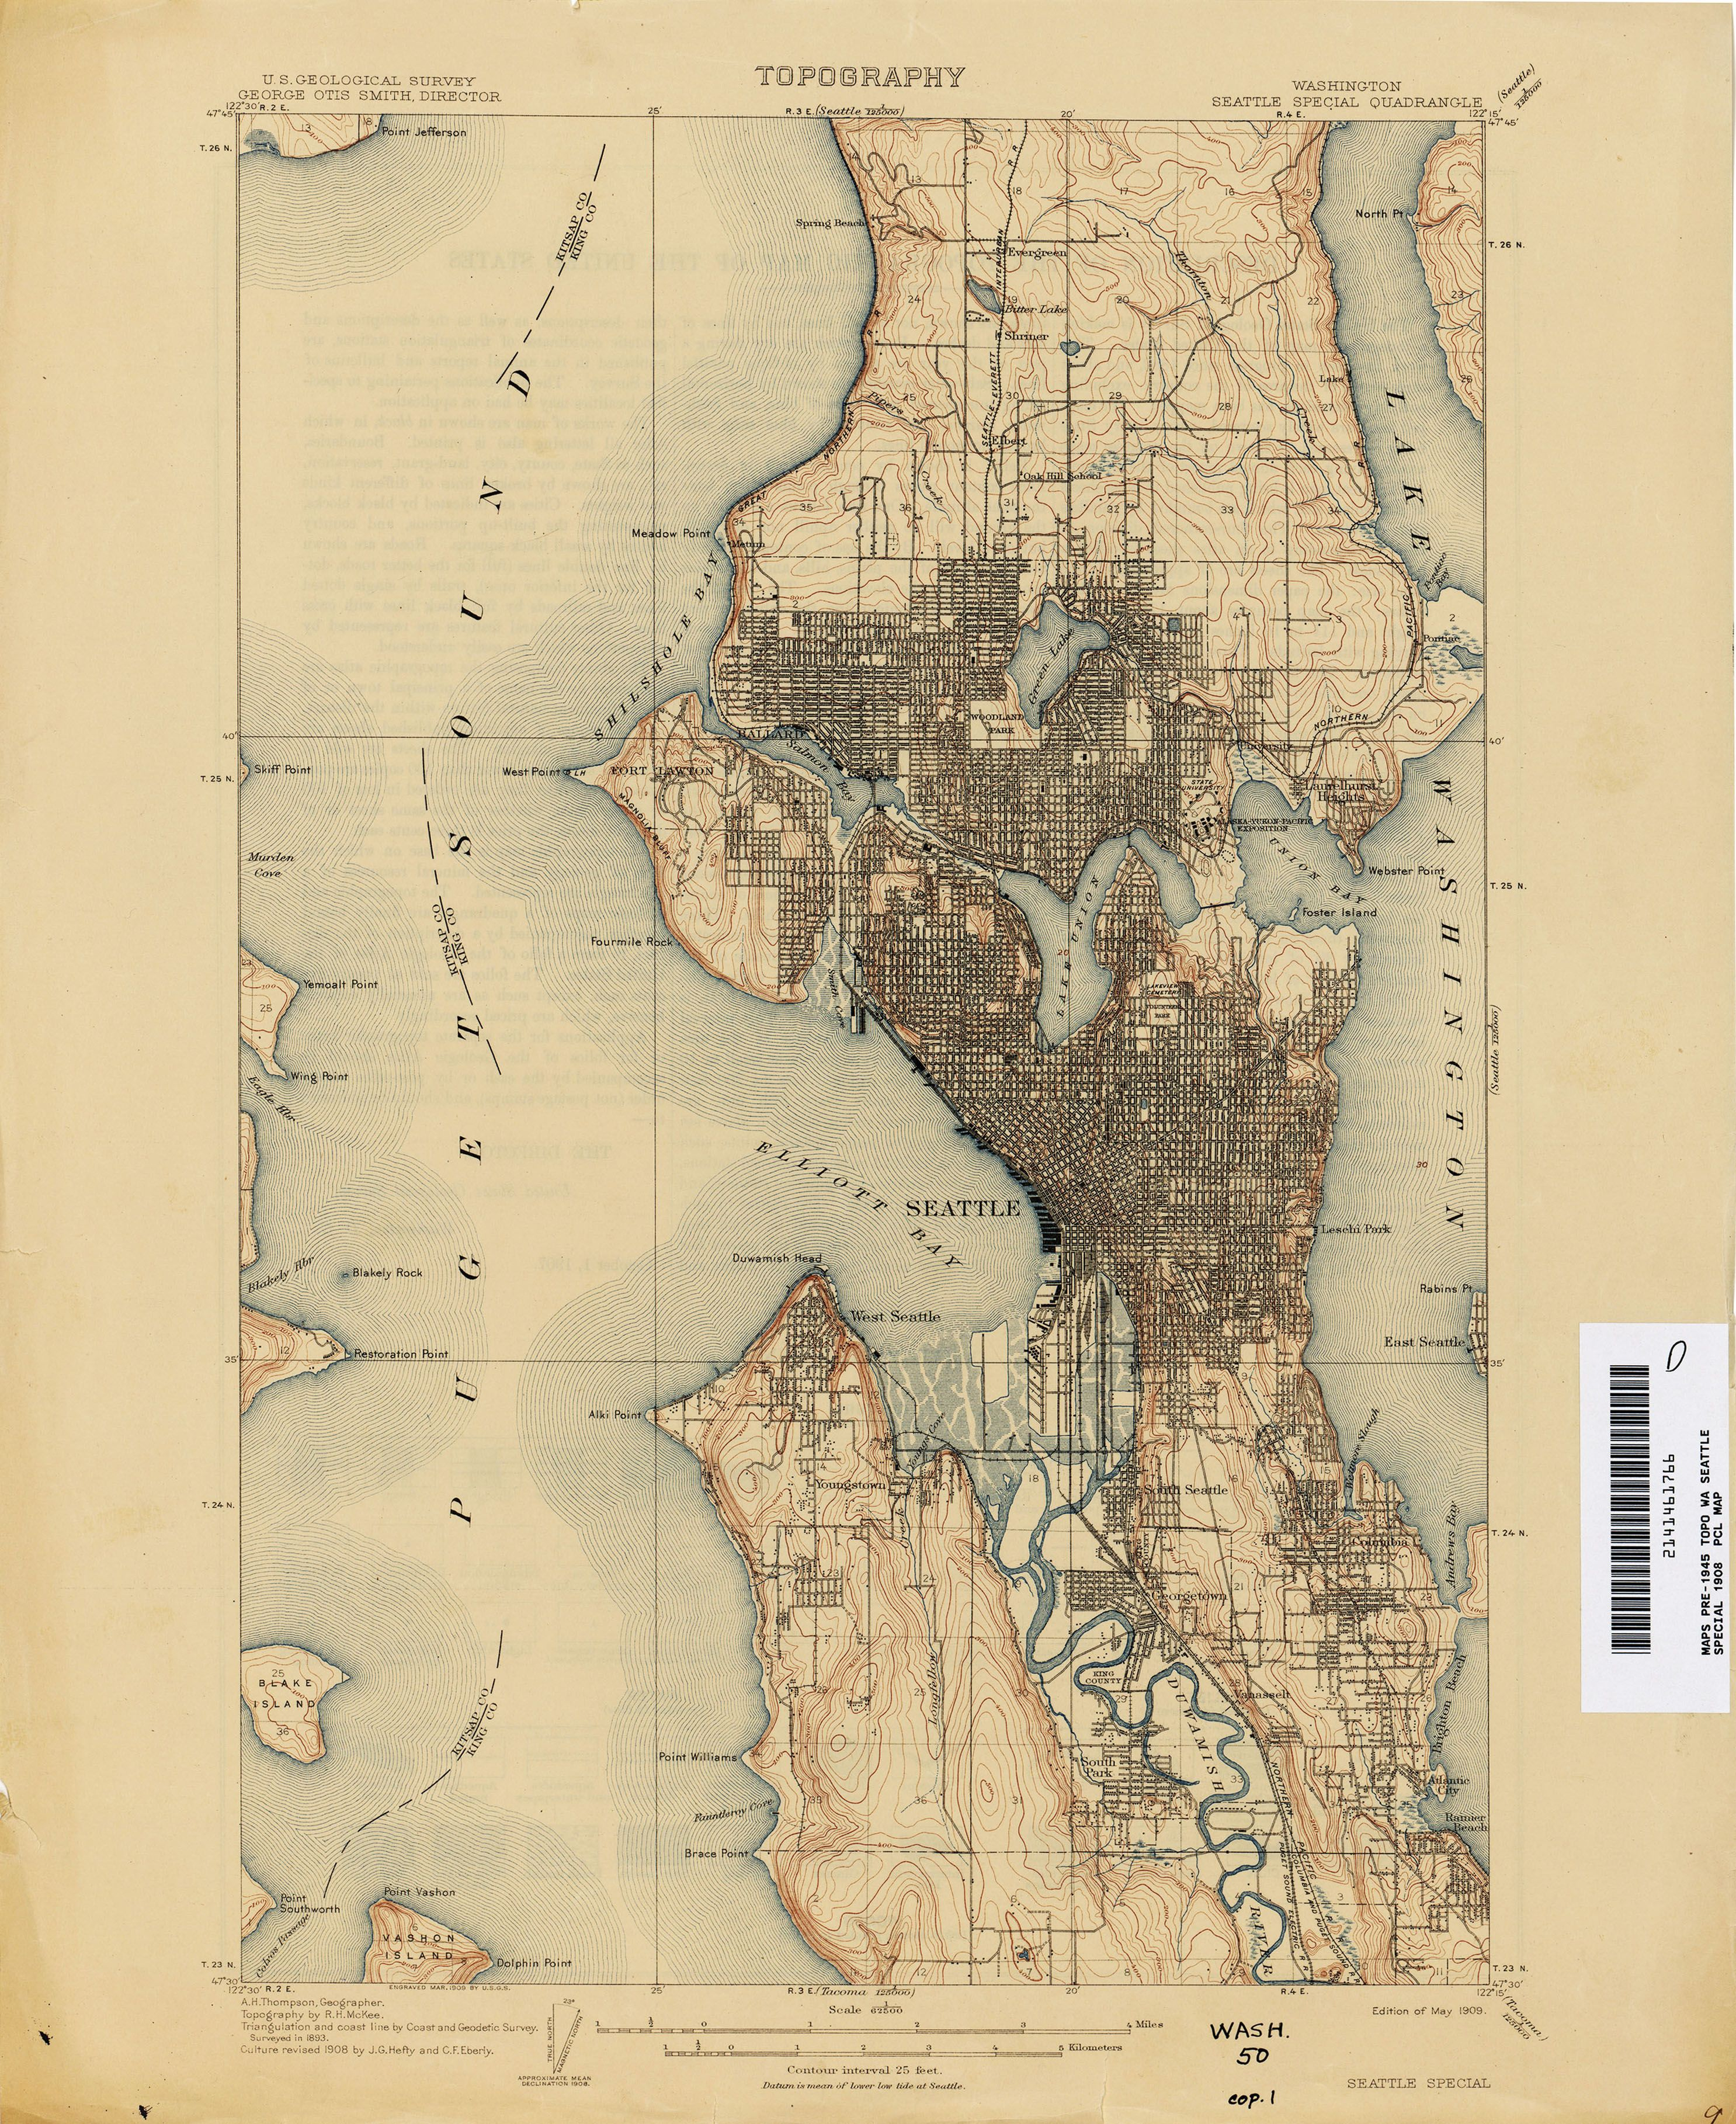 Txupclmapstopowaseattlespecial1908jpg 29723636 Pixels - Us Map 1908